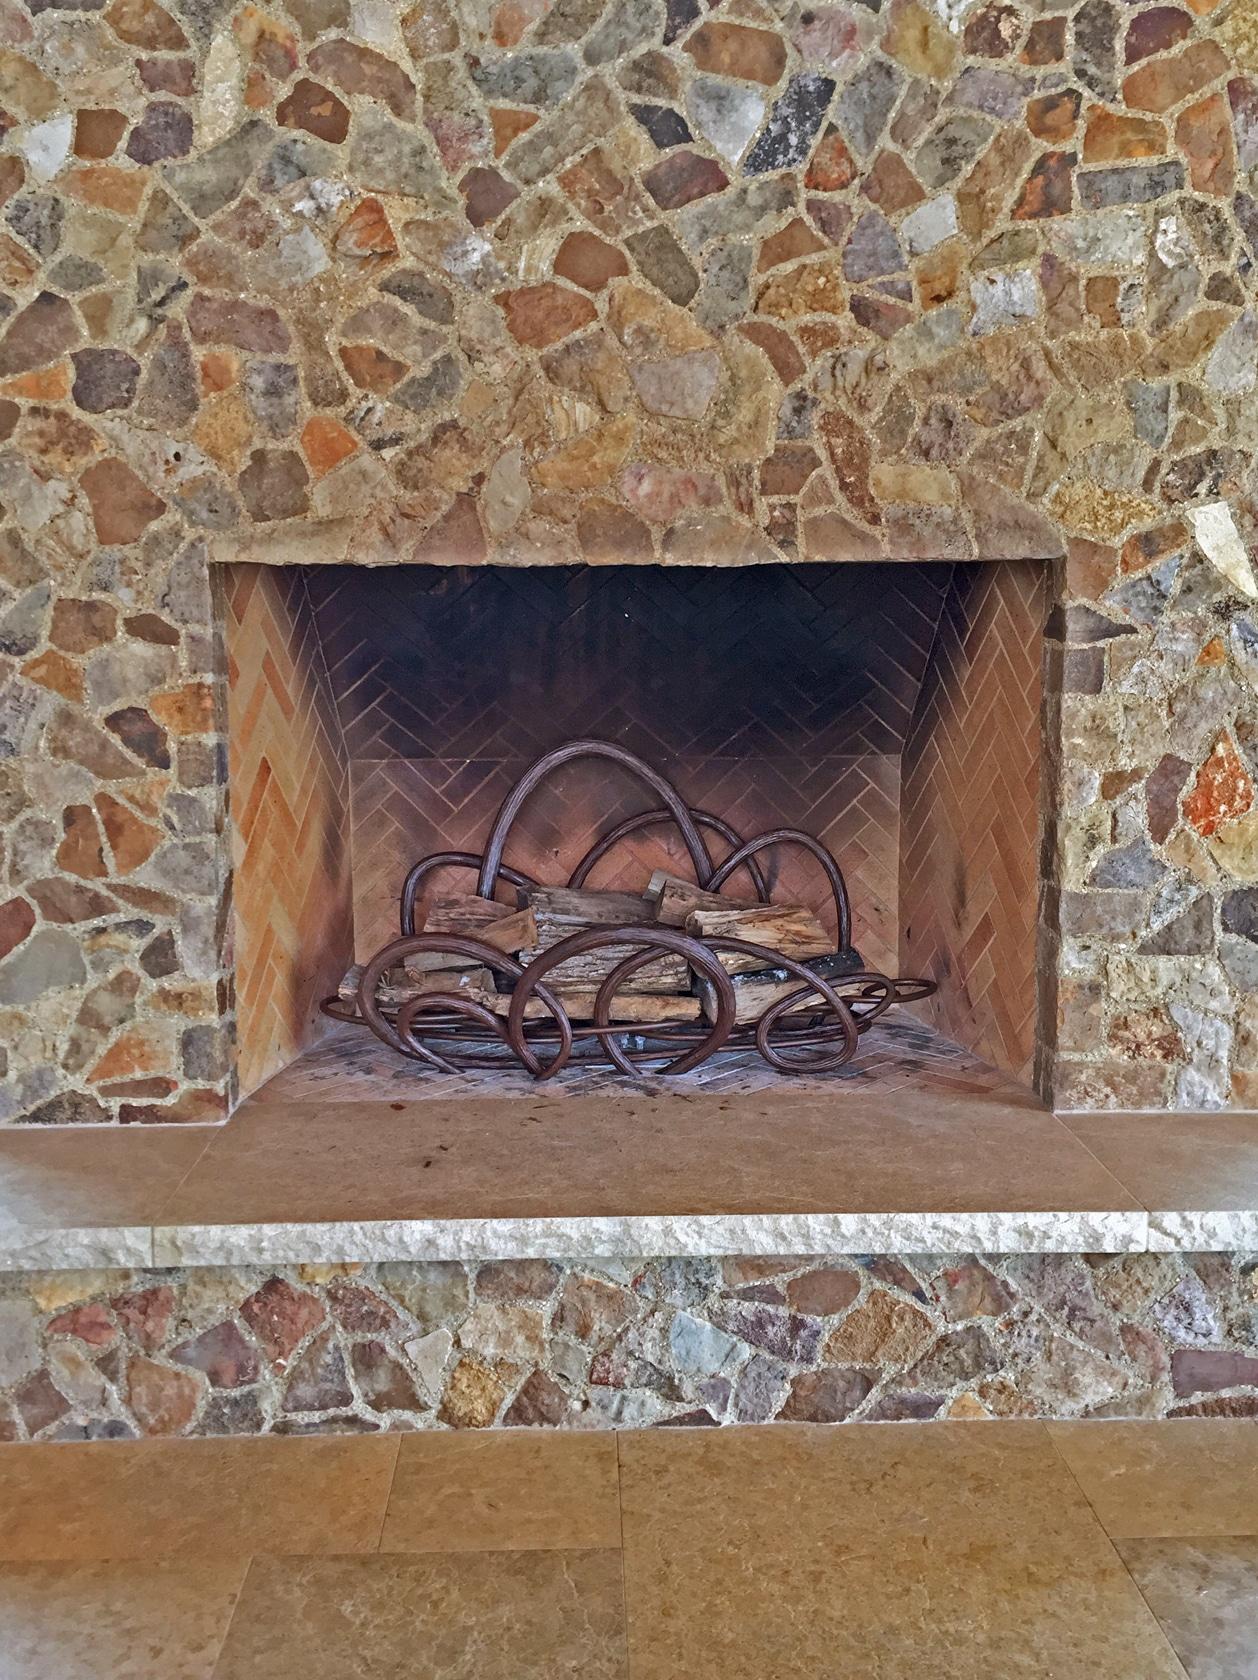 Blacksmith, Forged, Custom, Design, Daniel Hopper Design, Iron, Steel, Fireplace, Andirons, Grates, Texture